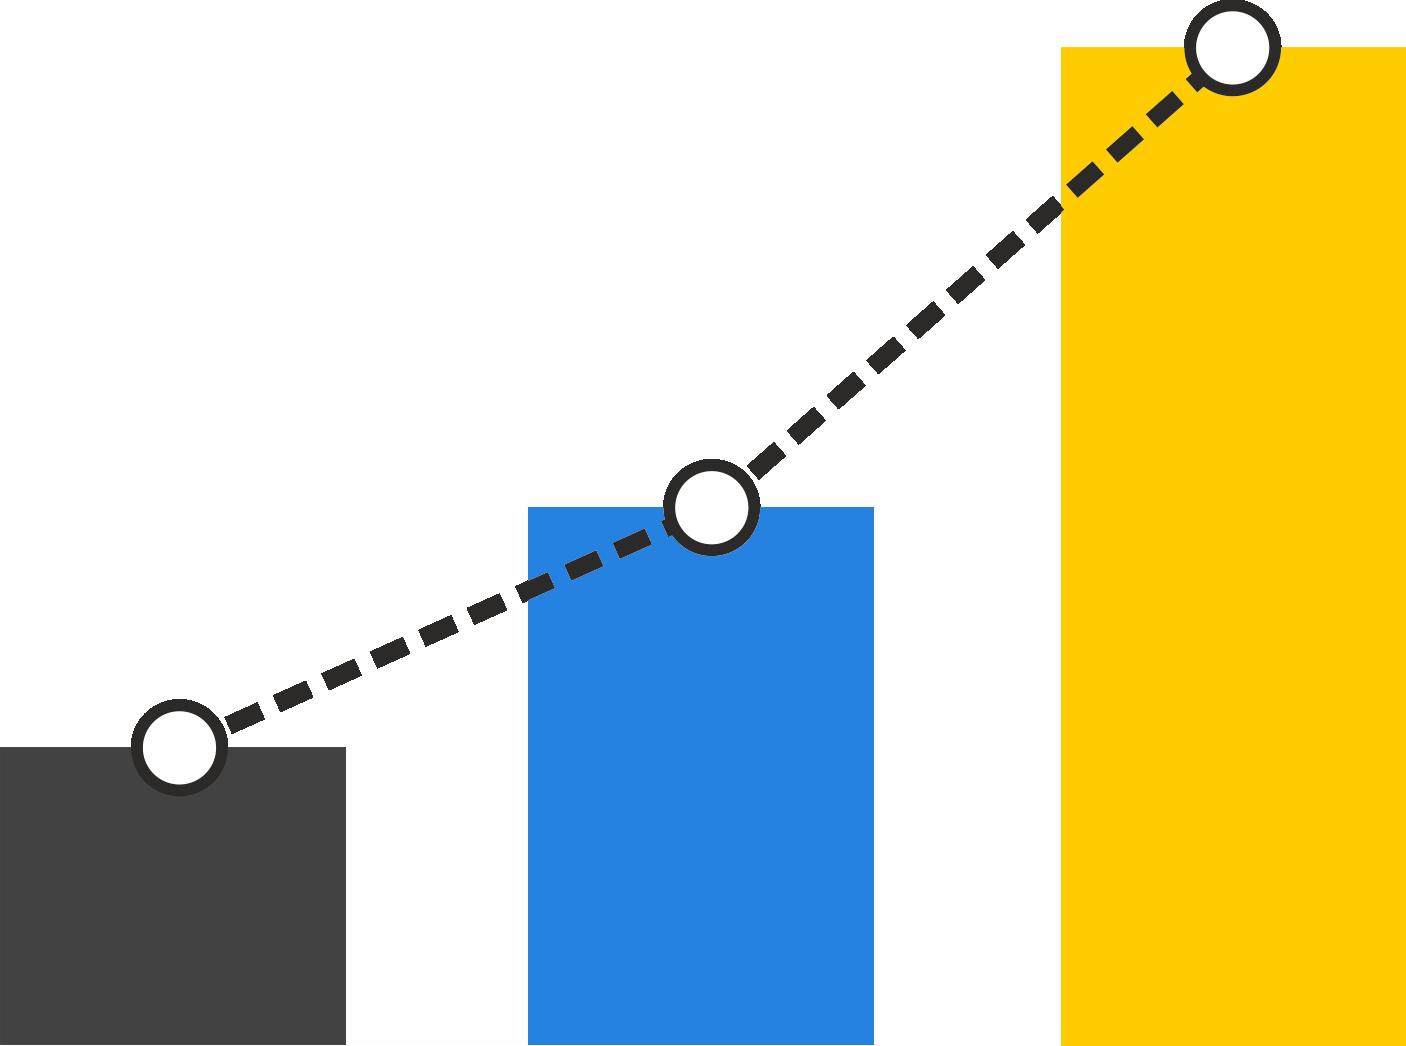 Imatge 11_autoresposabilitat i progresio.png